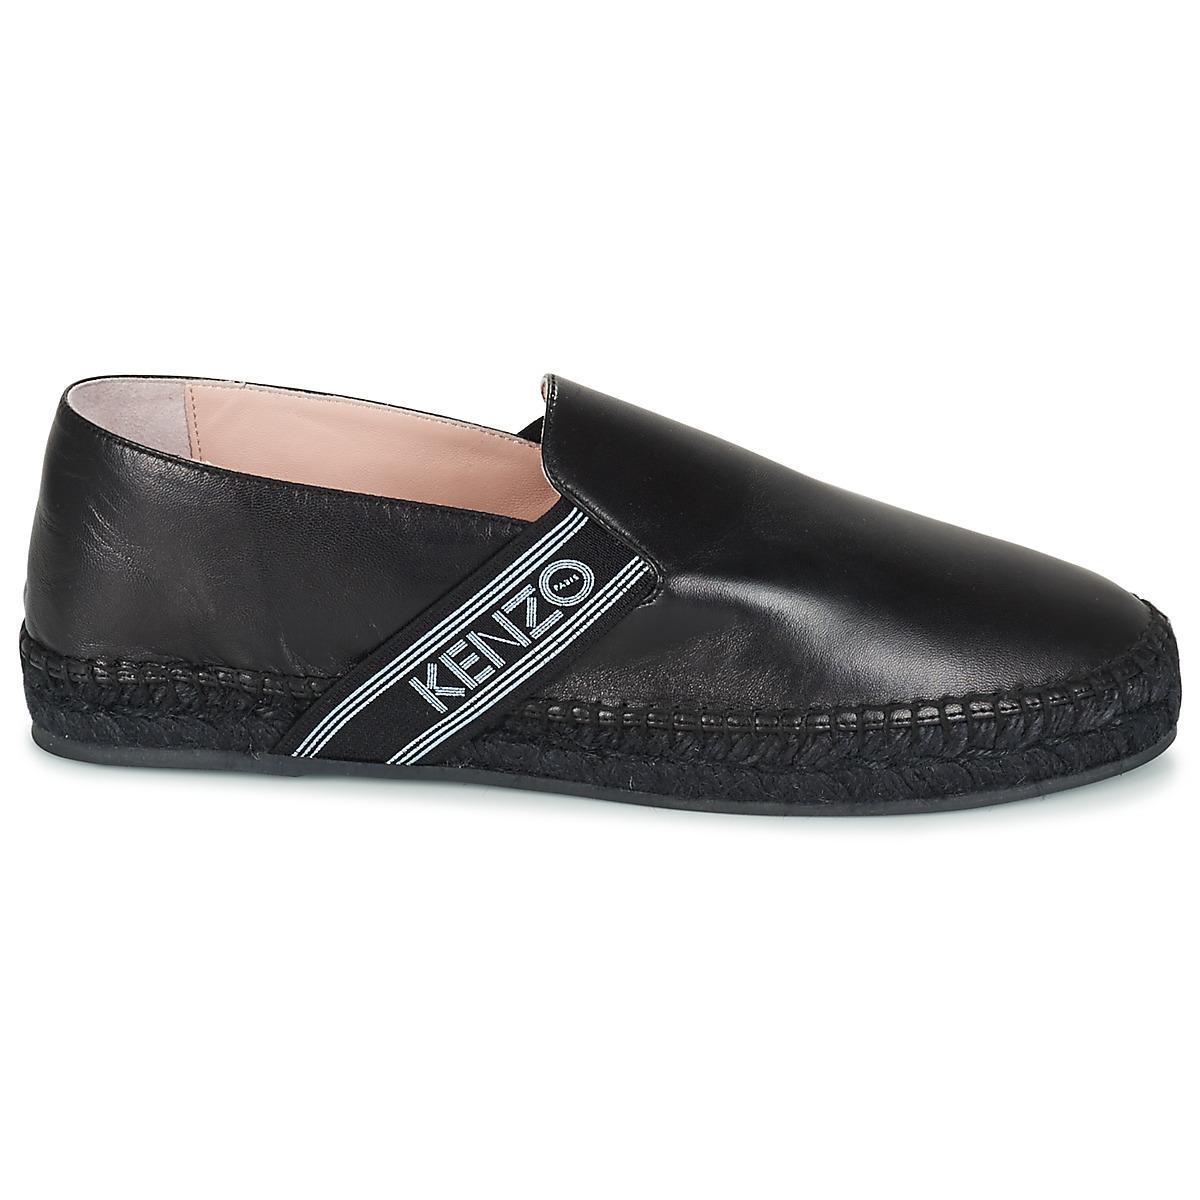 965e6d906 KENZO - Black Kapri Espadrilles / Casual Shoes - Lyst. View fullscreen